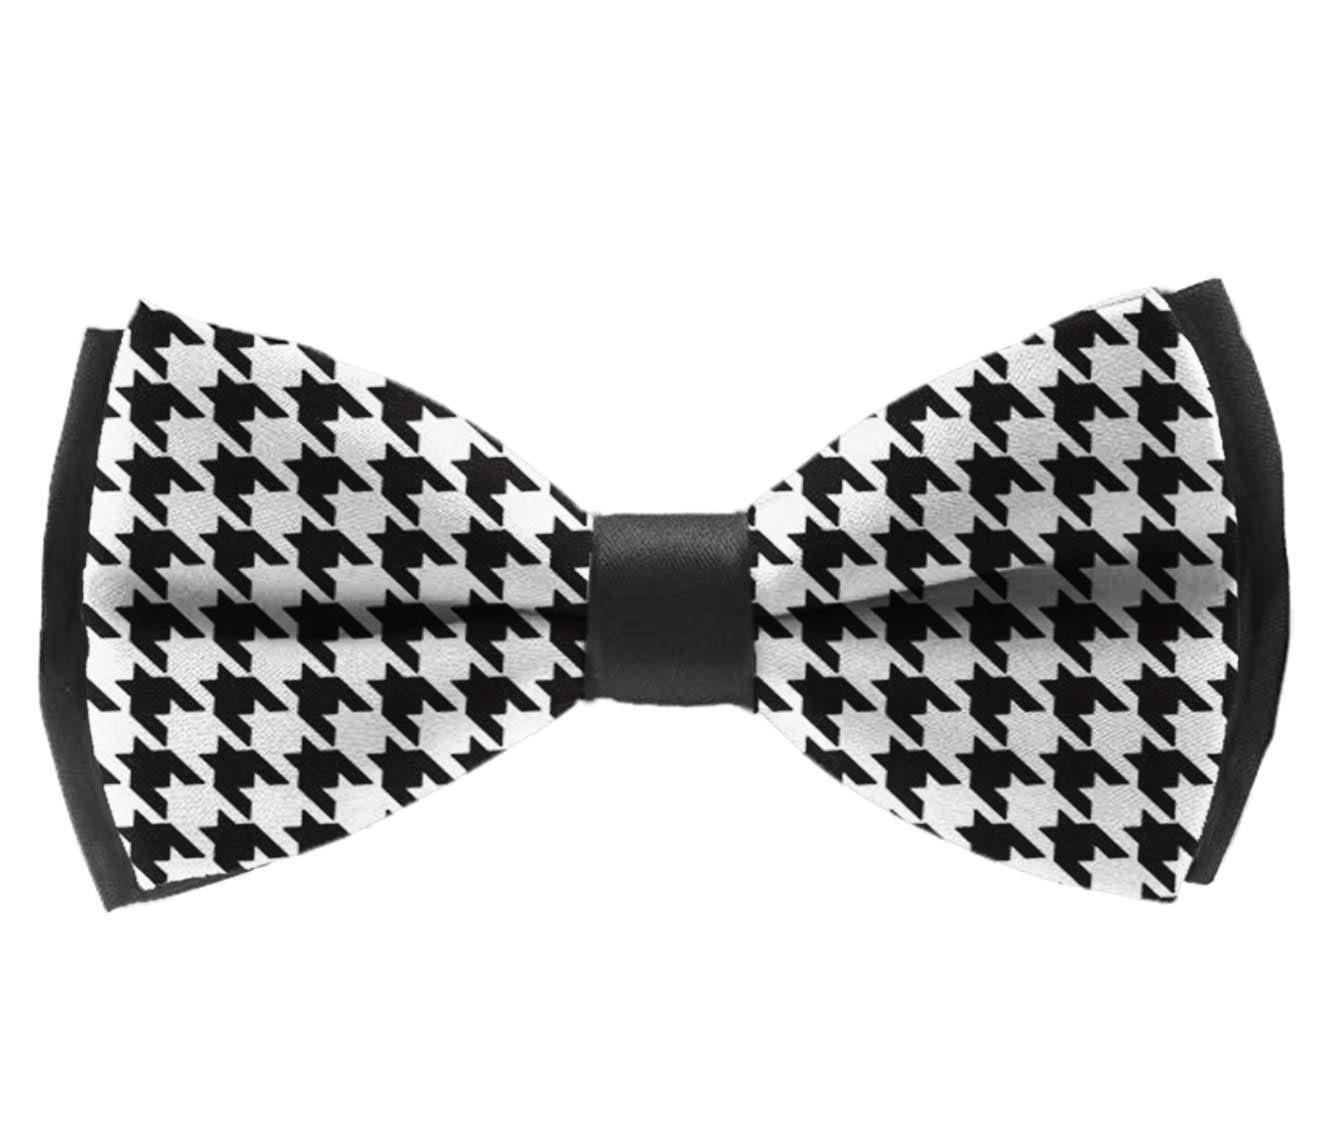 Adjustable Bowtie INWANZI Fashion Elegant Pre-Tied Bow Tie for Men /& Boys Black and White Houndstooth